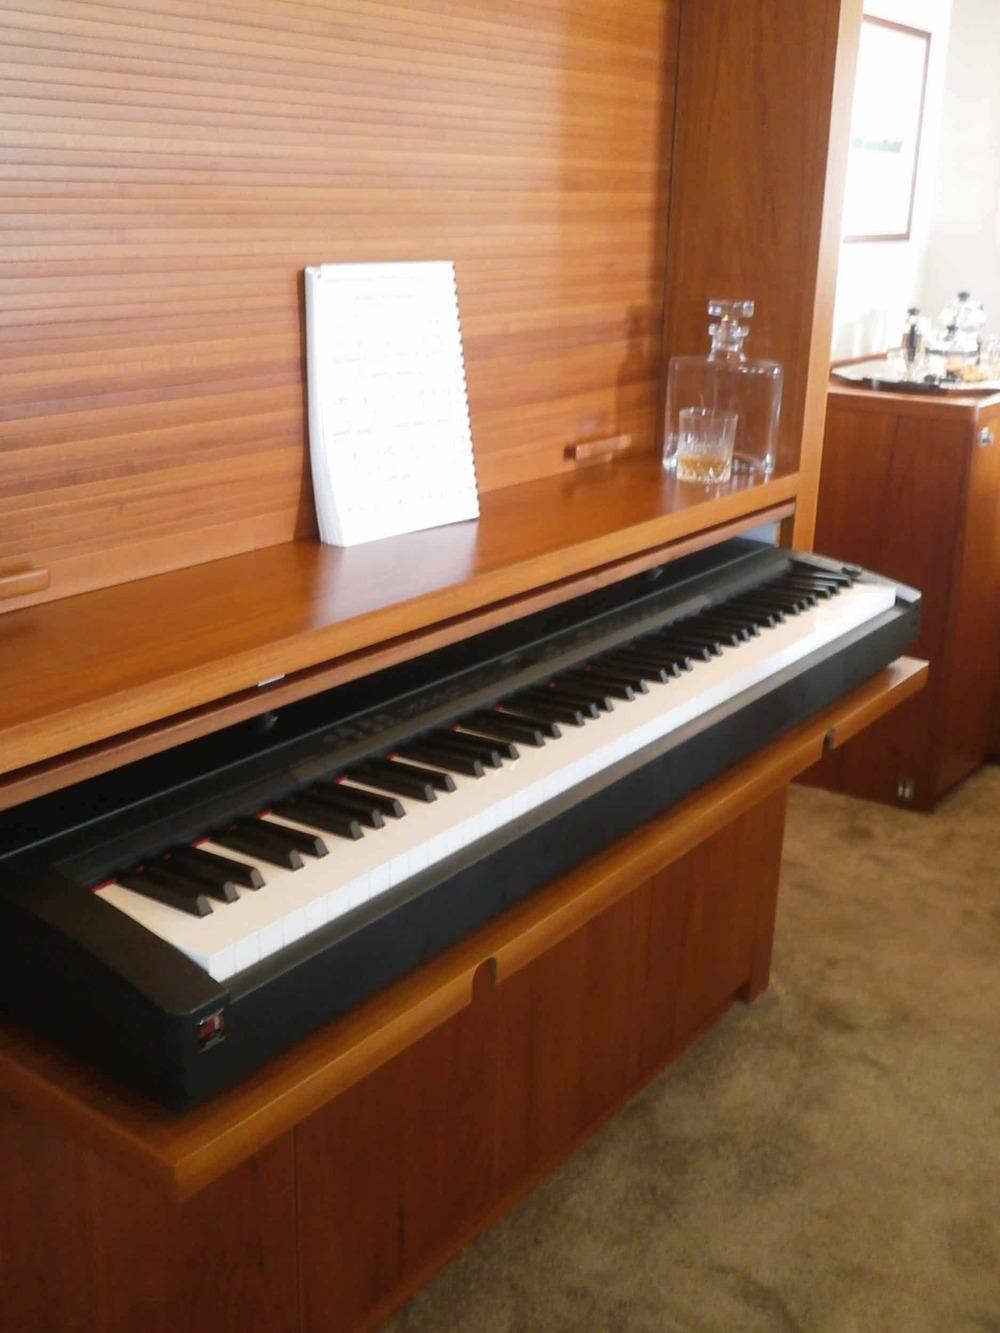 motor yacht Drenec piano.jpeg